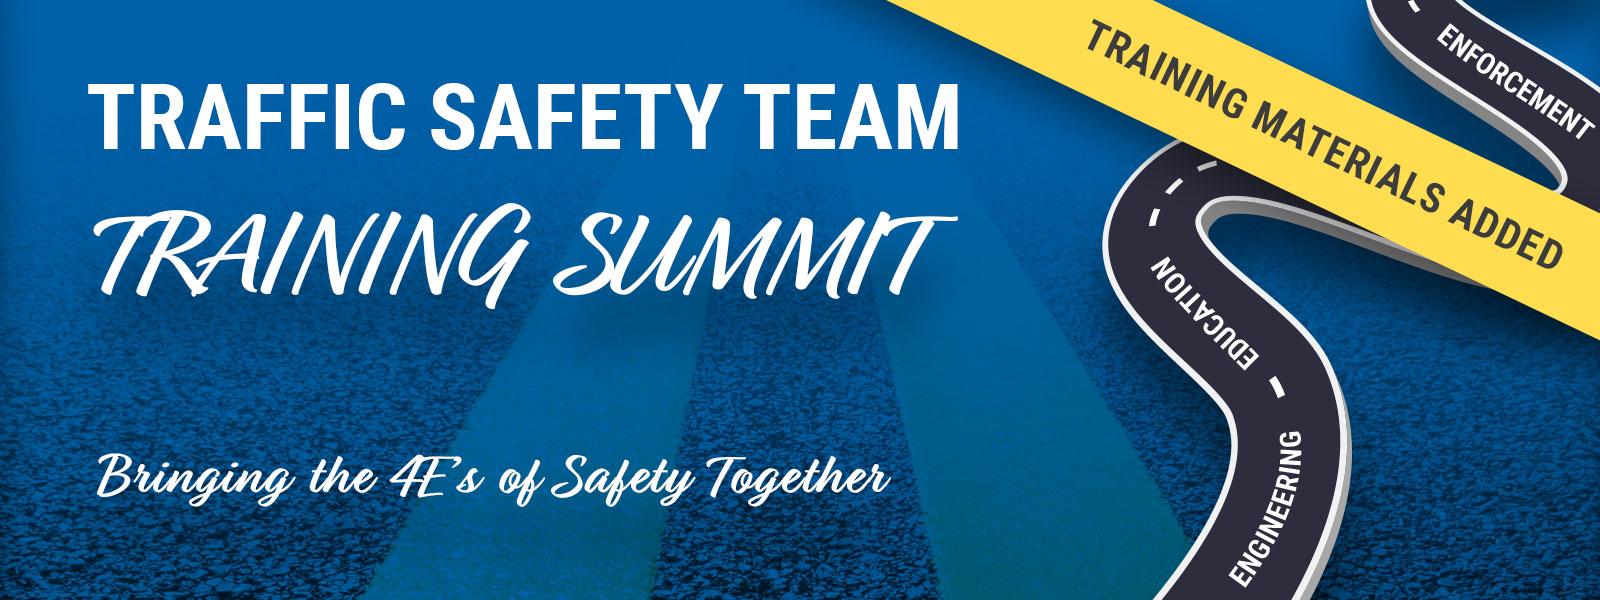 Traffic Safety Team Training Summit